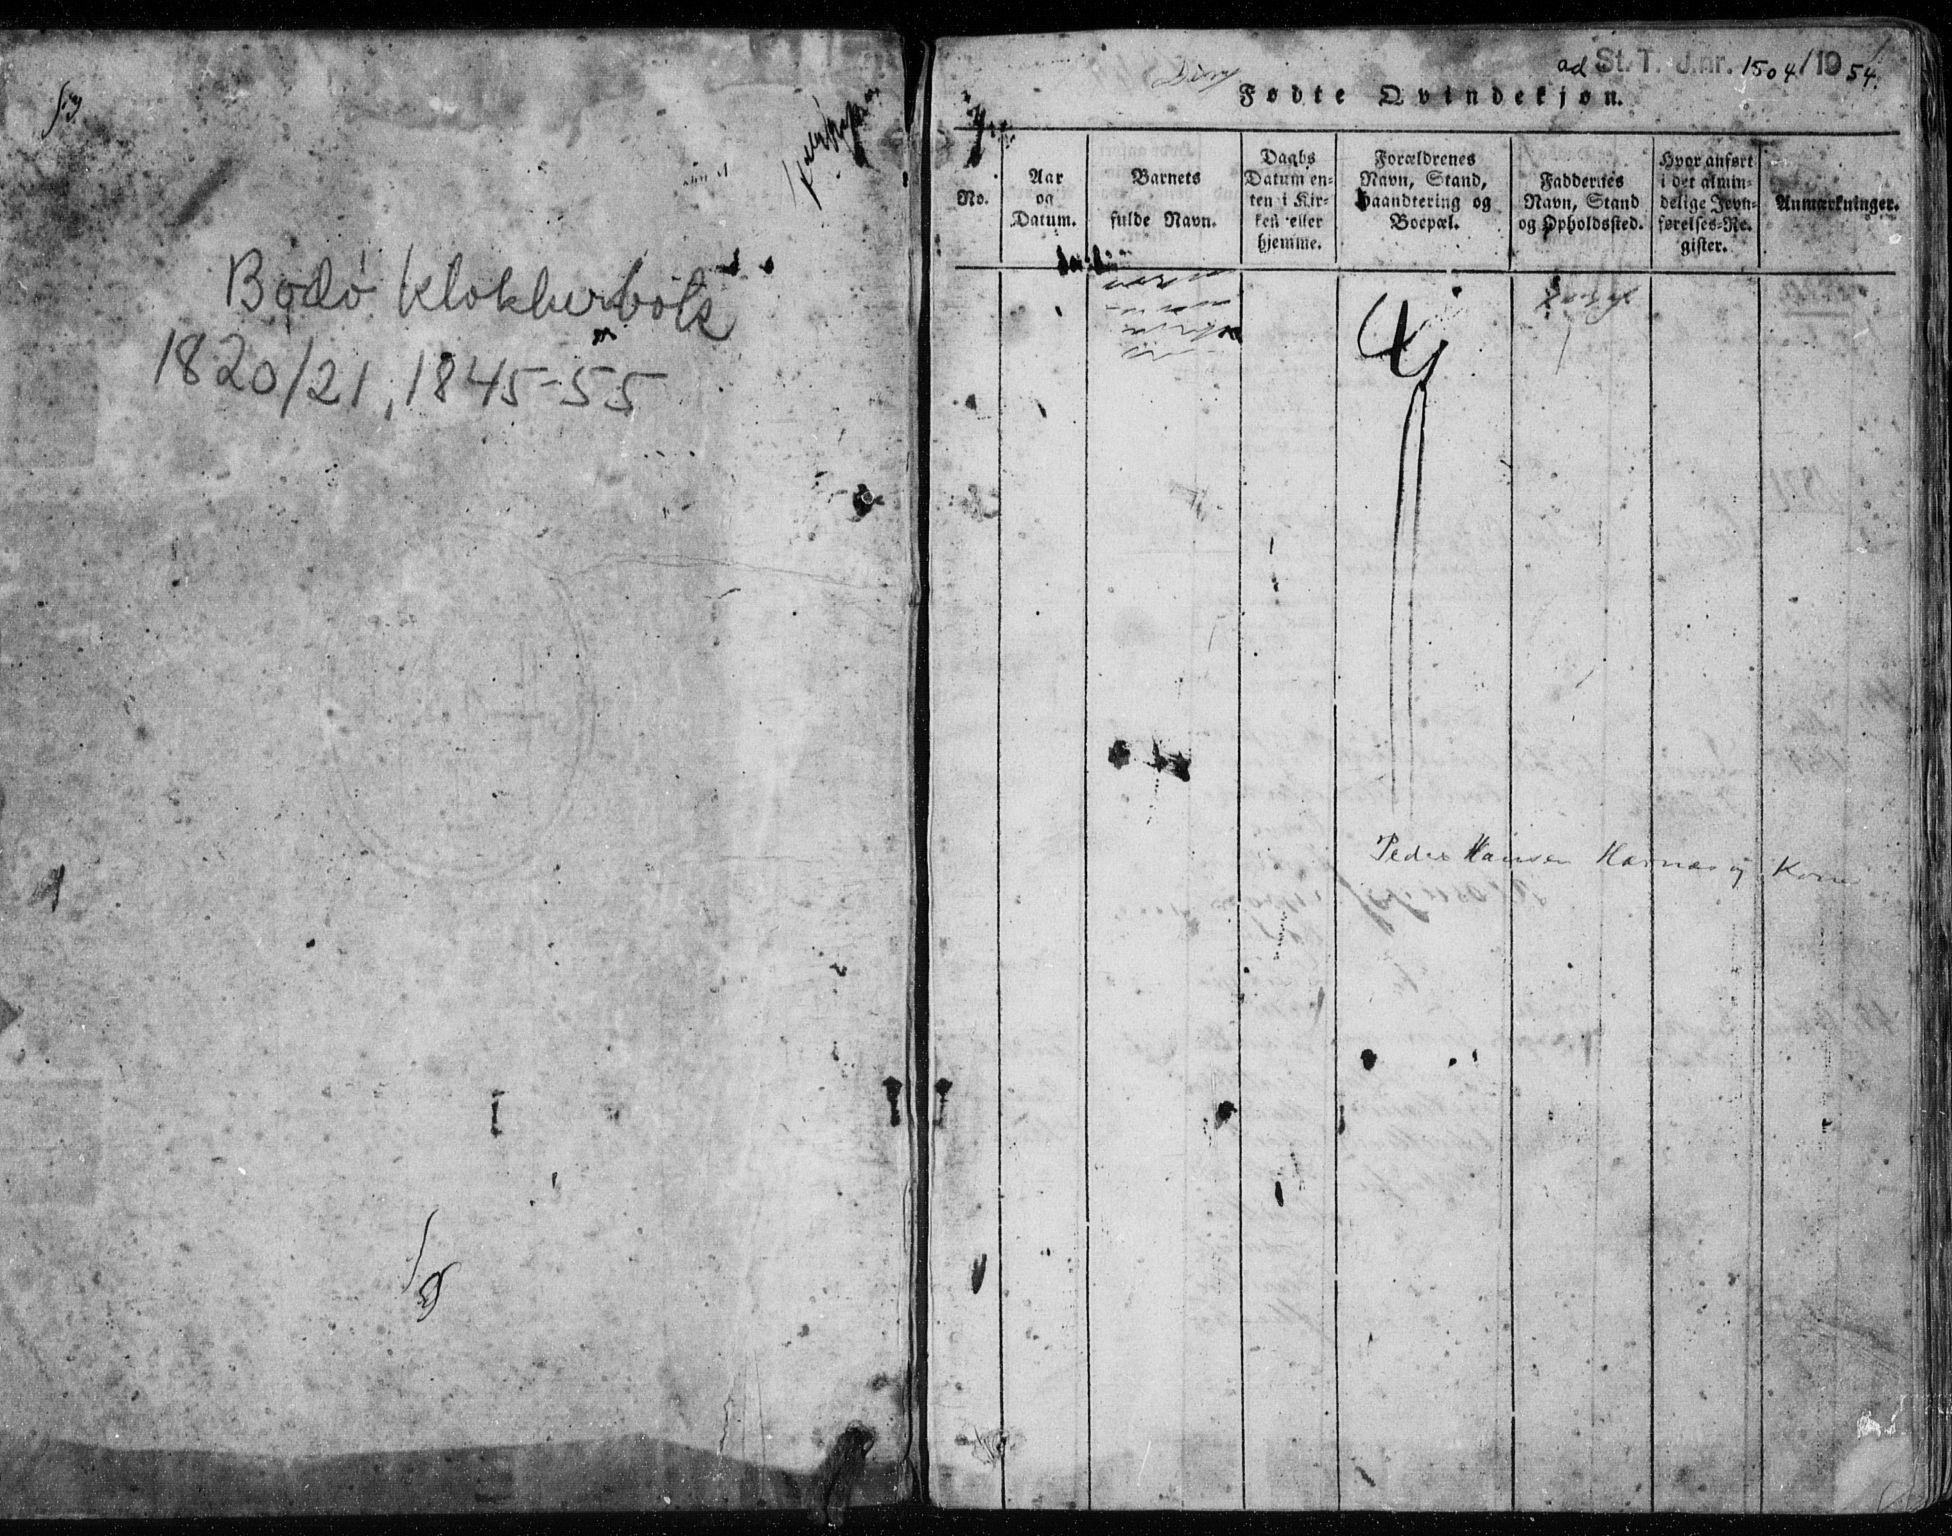 SAT, Ministerialprotokoller, klokkerbøker og fødselsregistre - Nordland, 801/L0026: Klokkerbok nr. 801C01, 1820-1855, s. 0-1